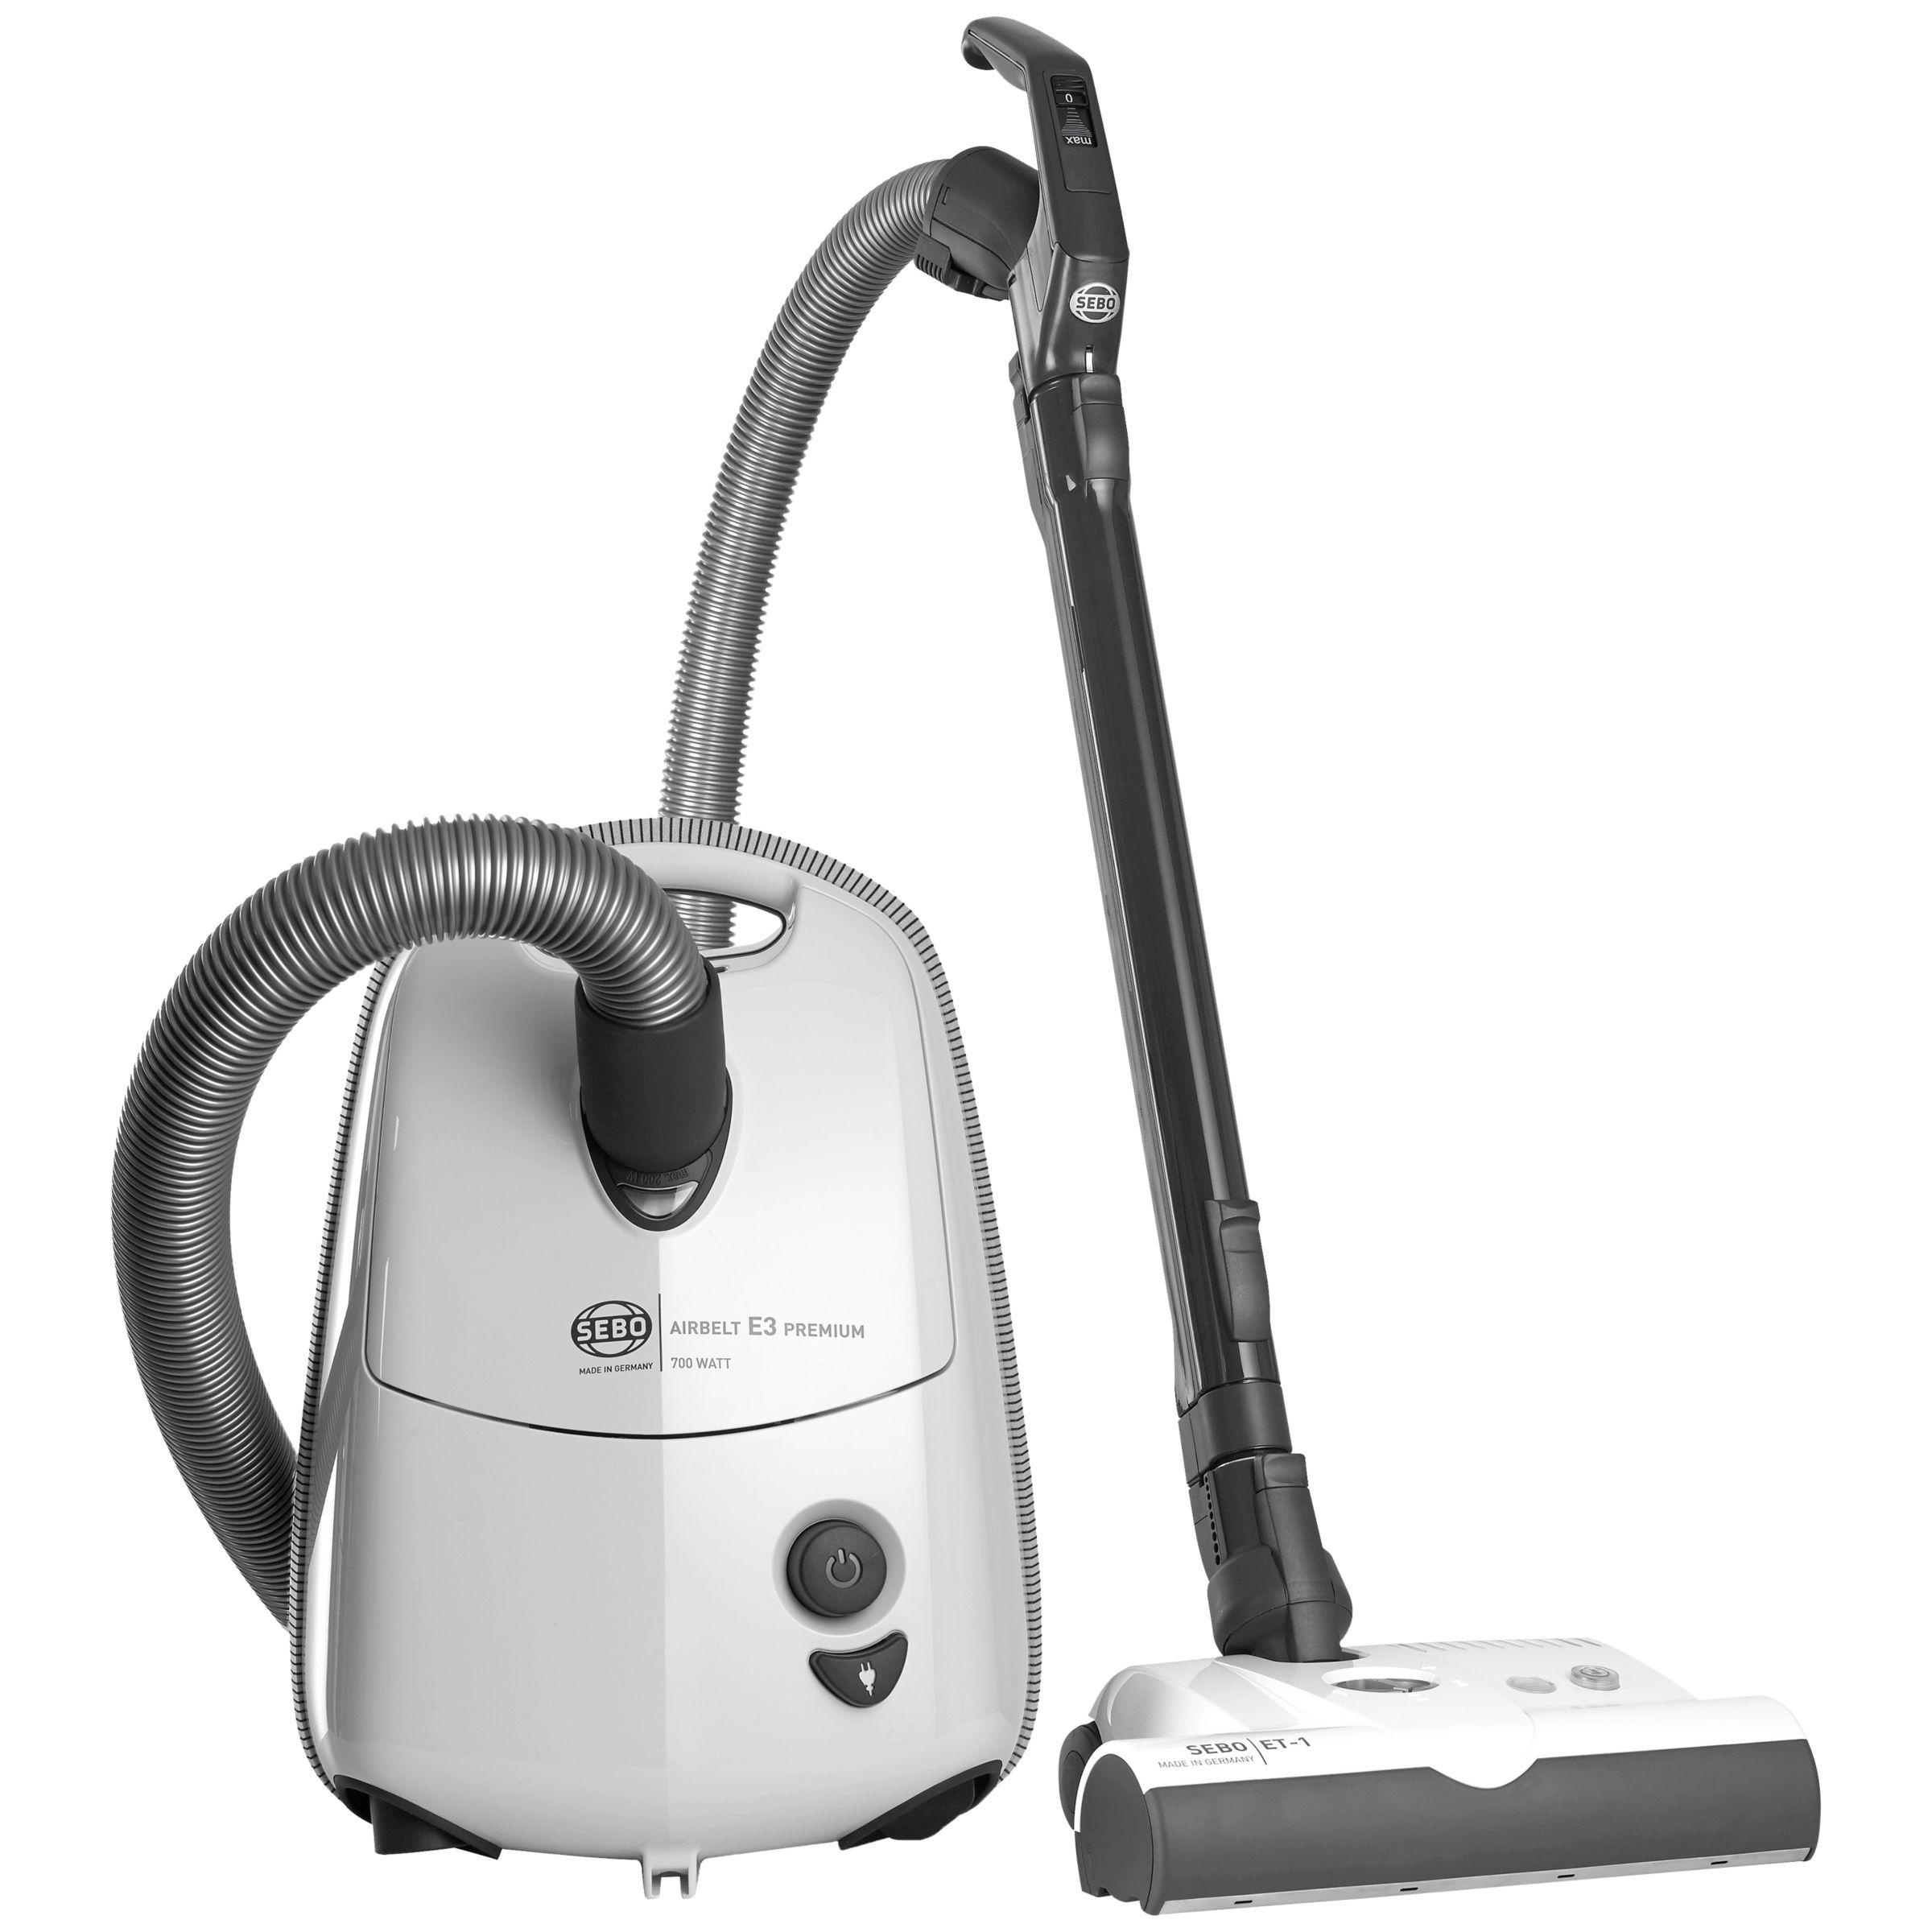 Sebo Sebo 91641GB Airbelt E3 Premium Cylinder Vacuum Cleaner, White